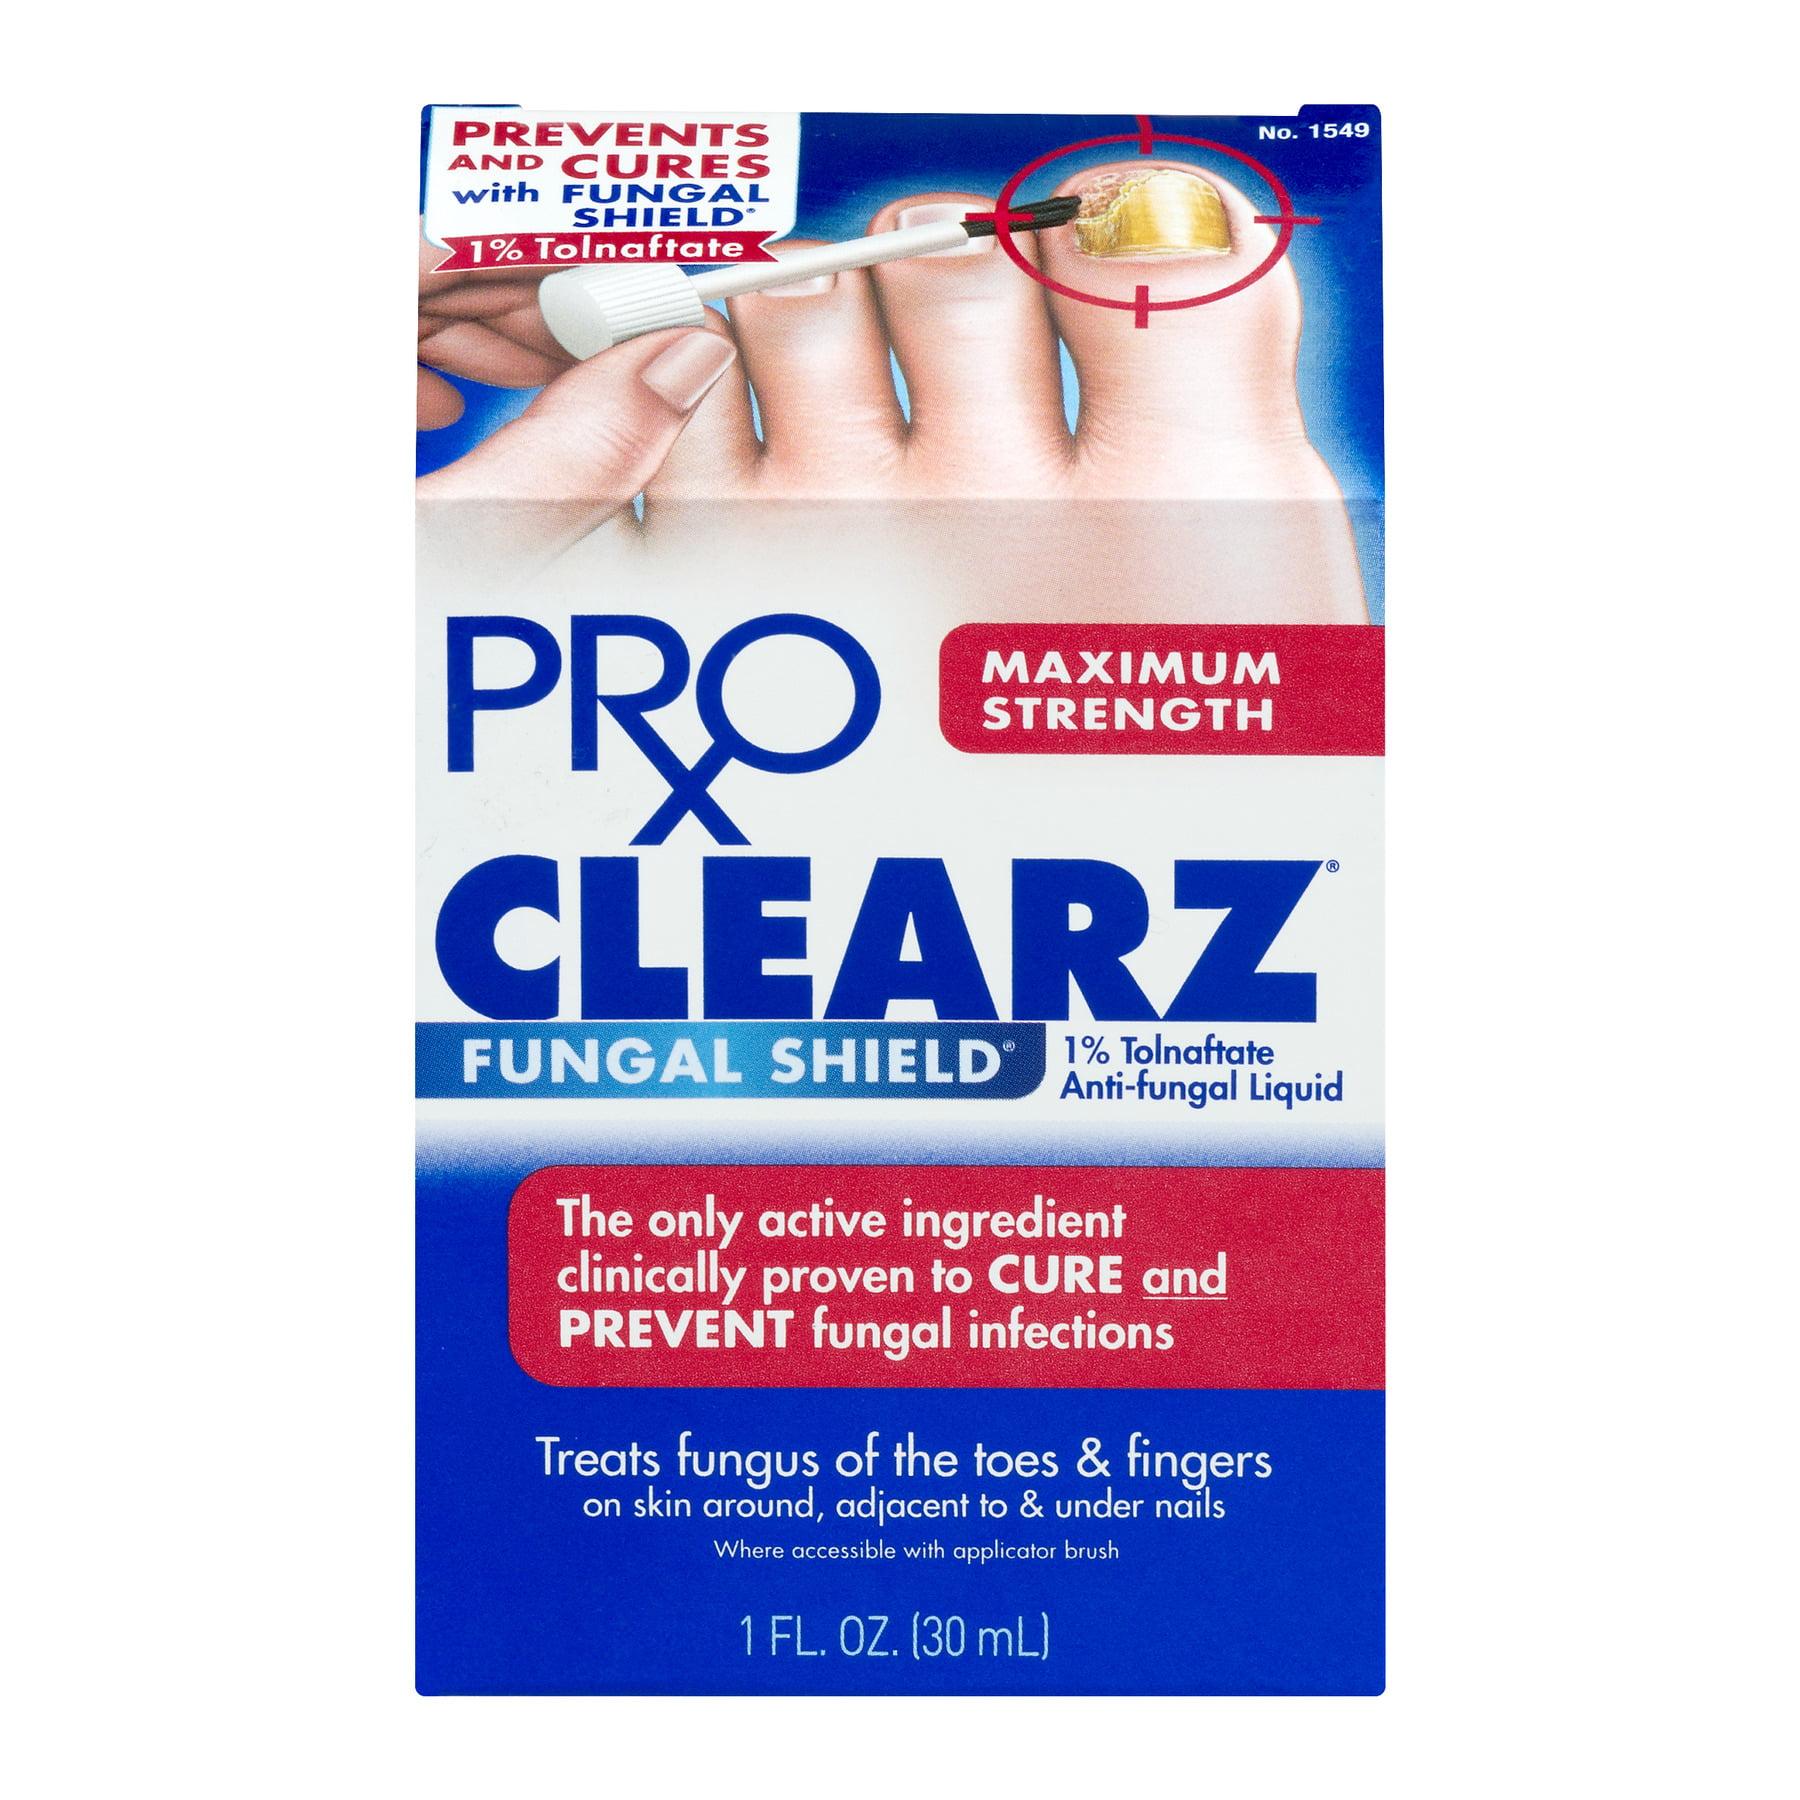 Profoot Pro Clearz Fungal Shield, 1.0 FL OZ